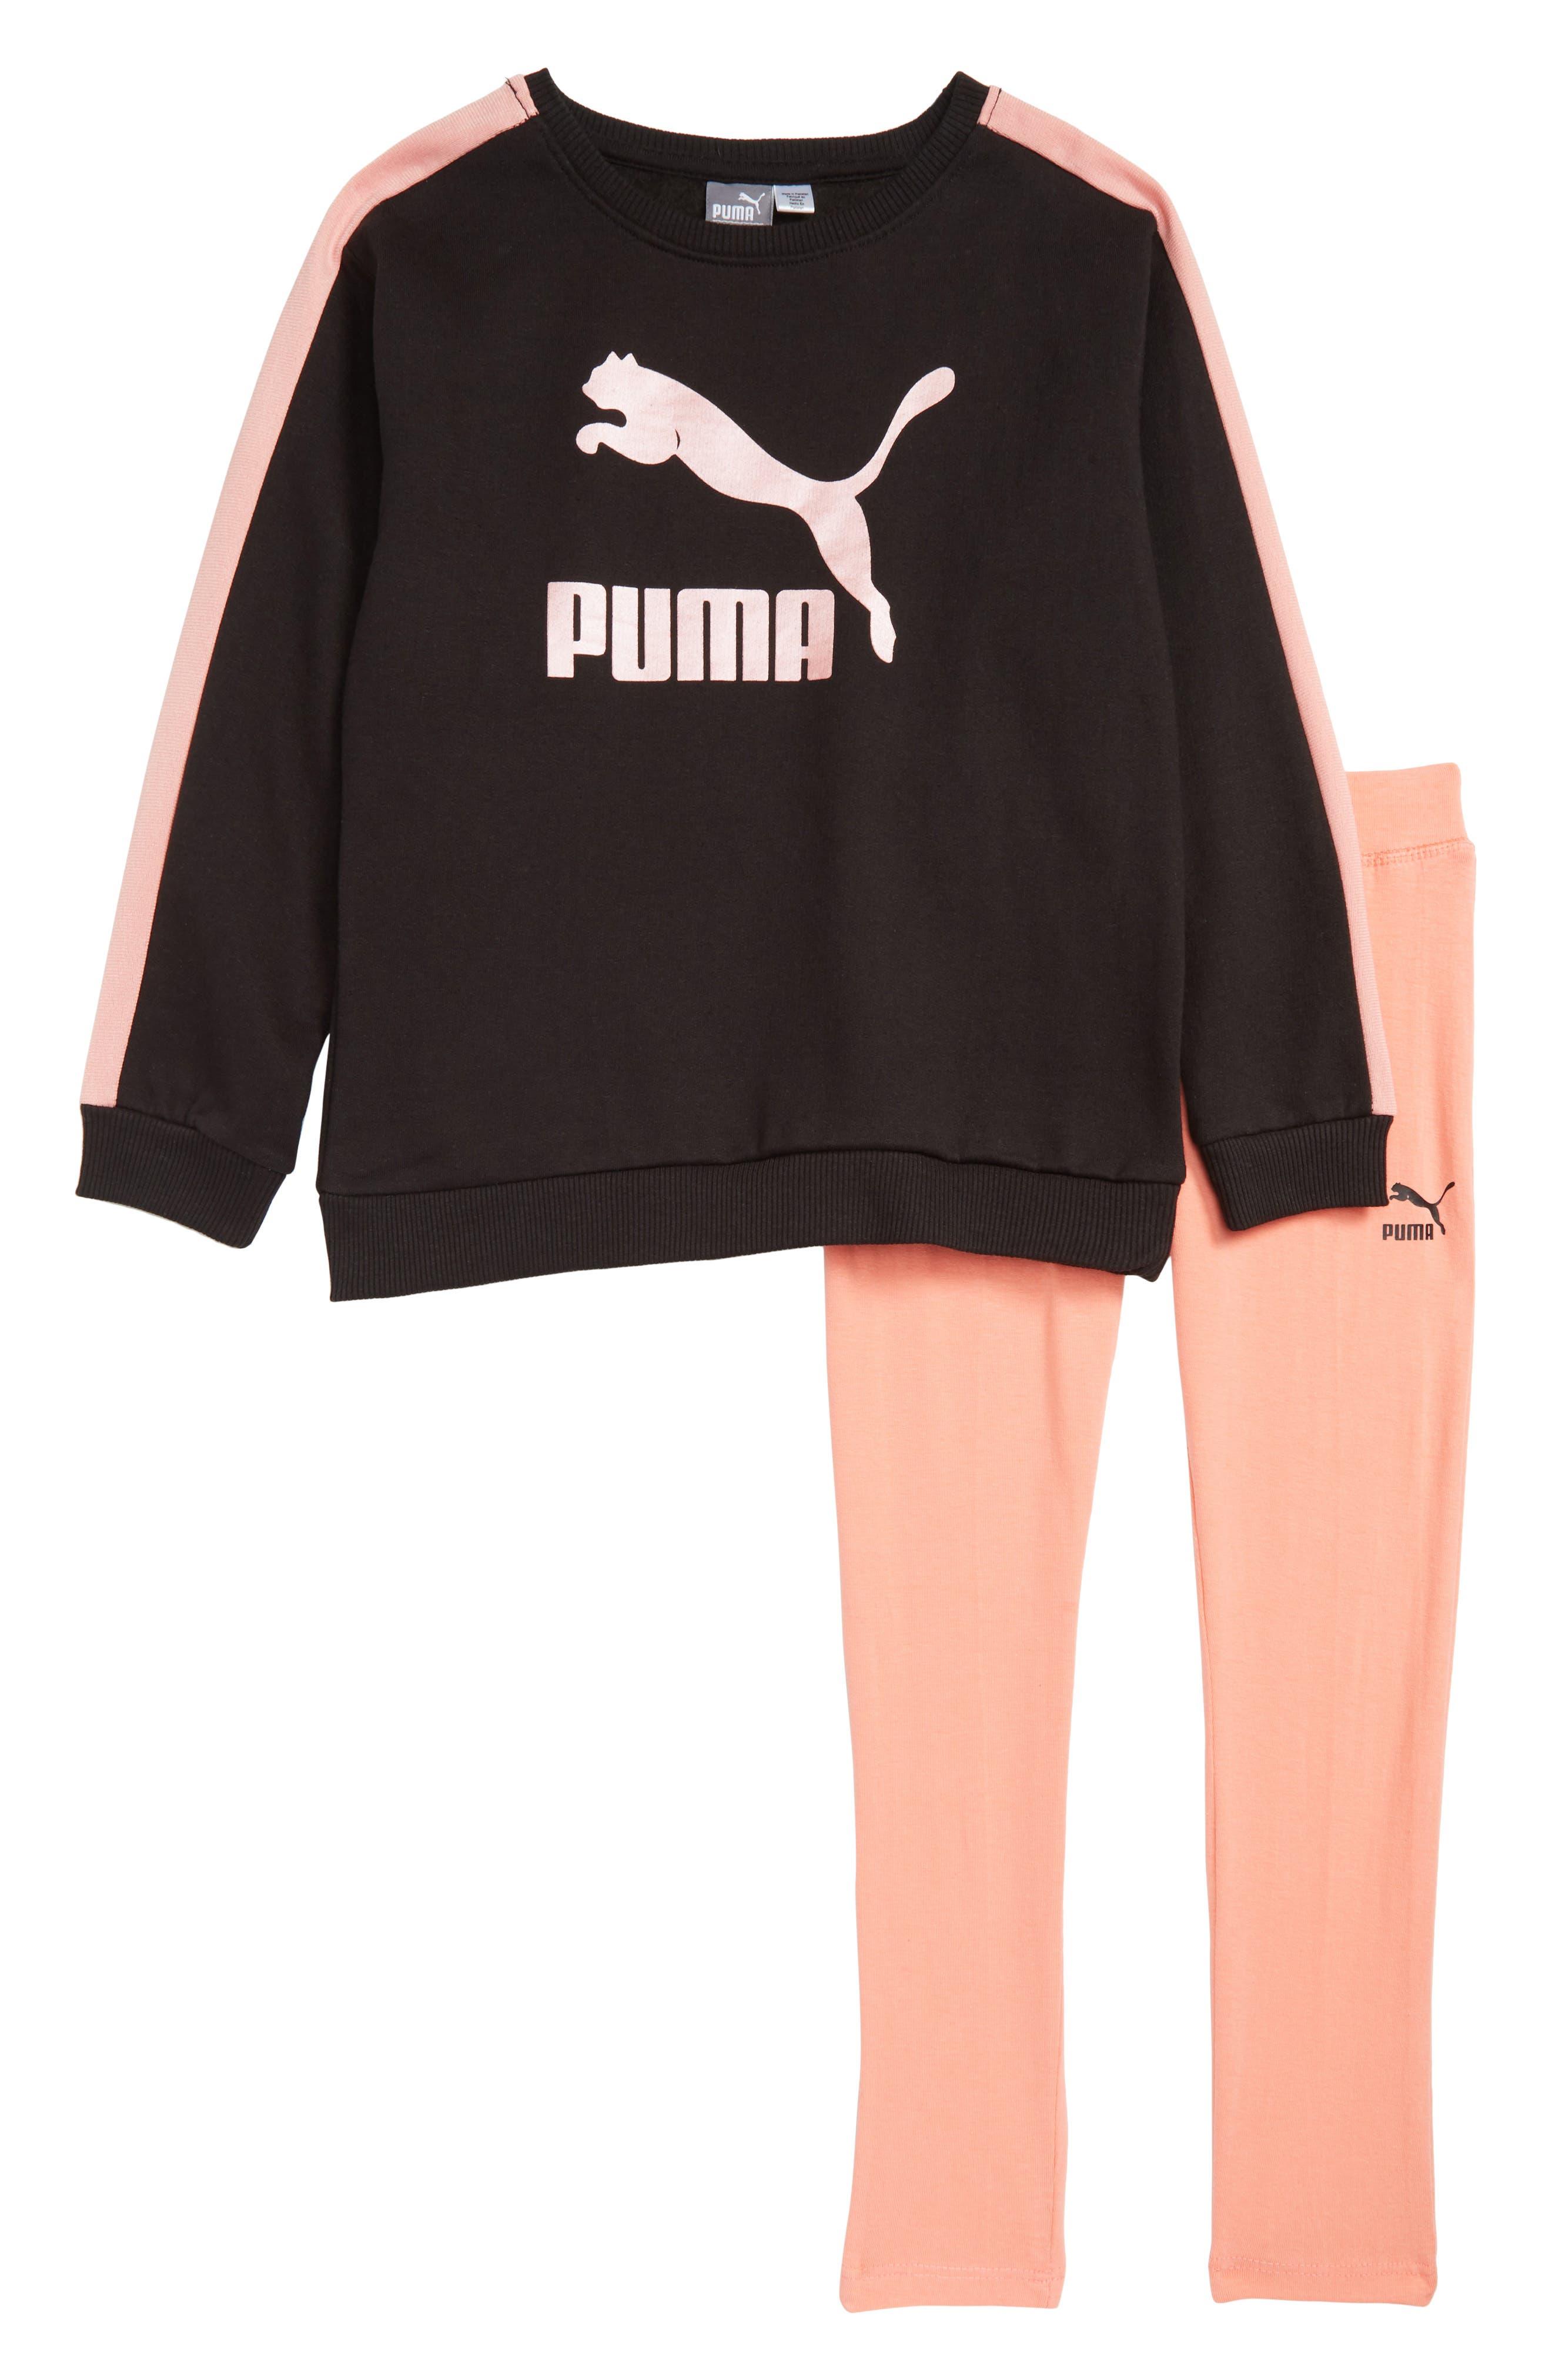 Girls Puma Logo Fleece Sweatshirt  Leggings Set